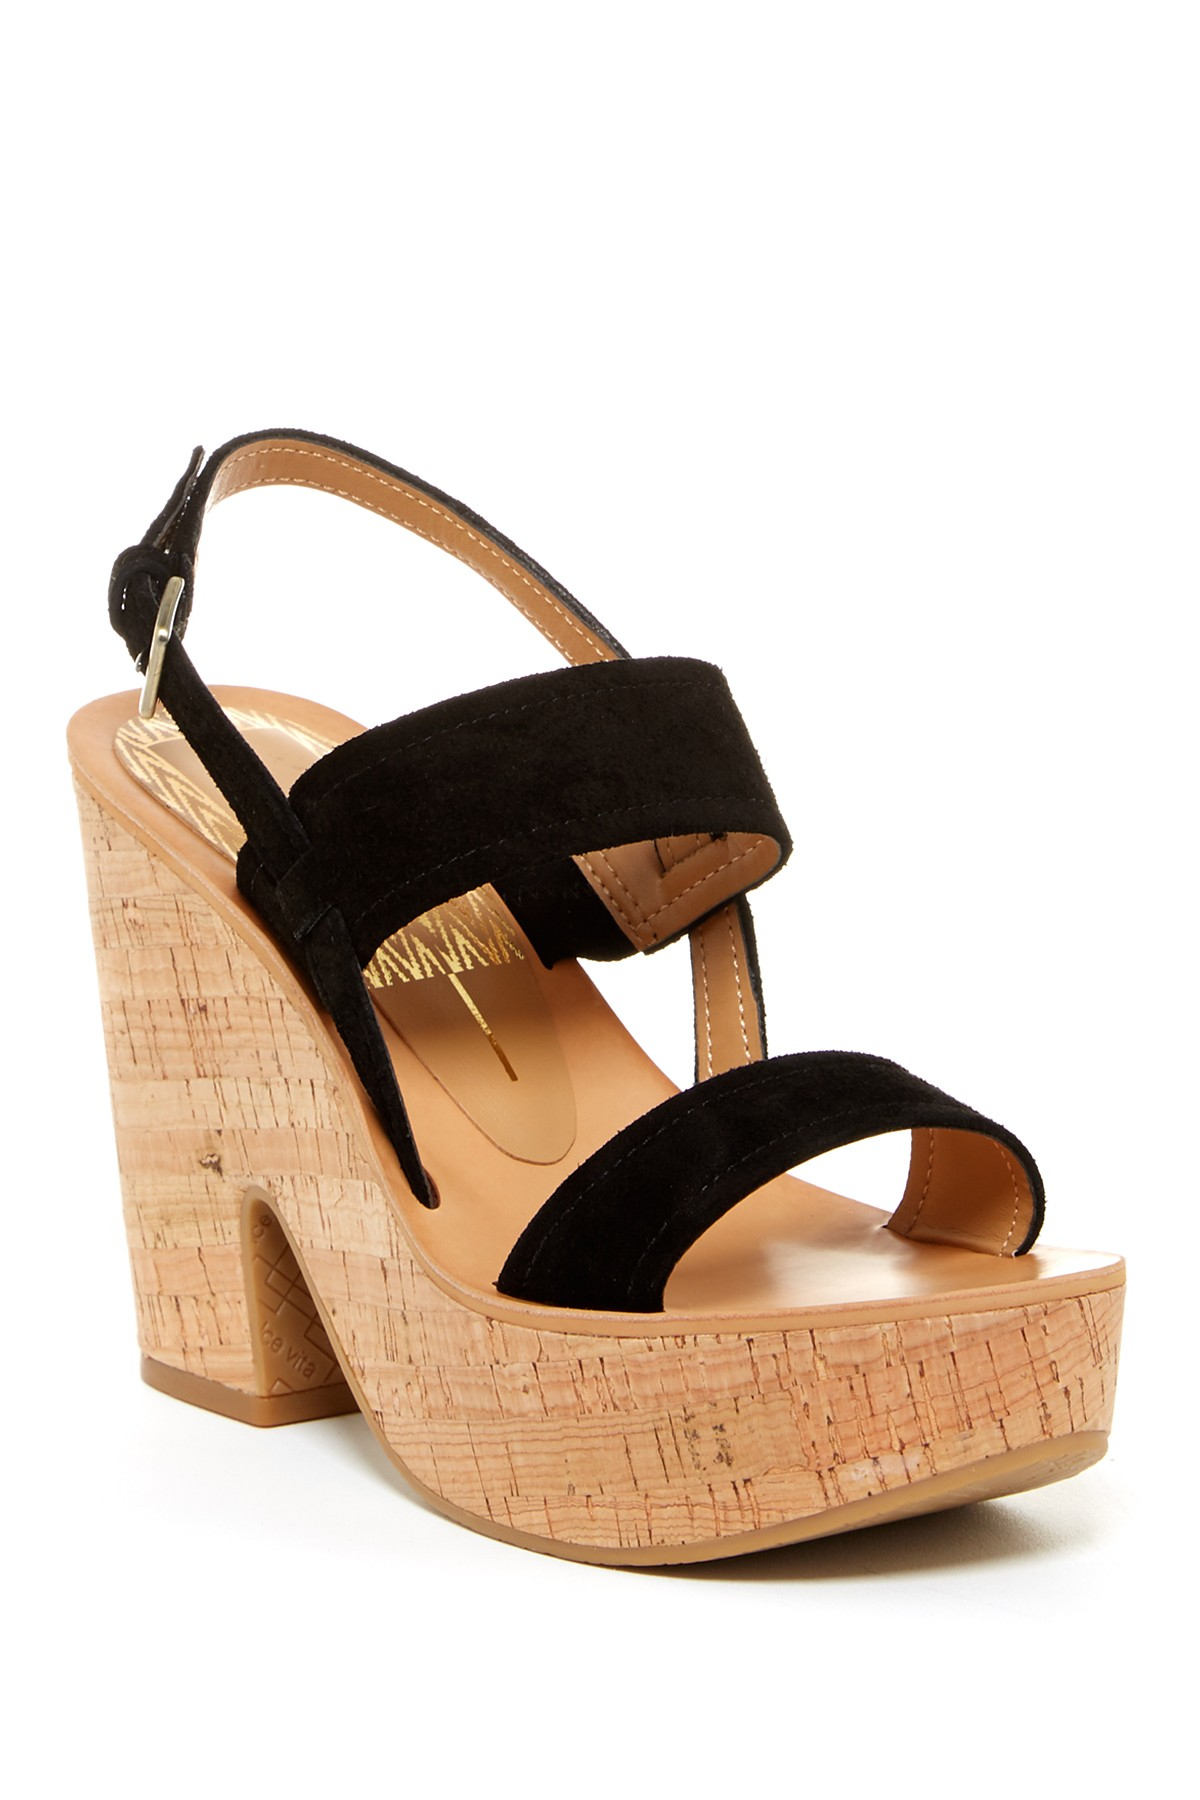 dolce vita platform sandal in black lyst